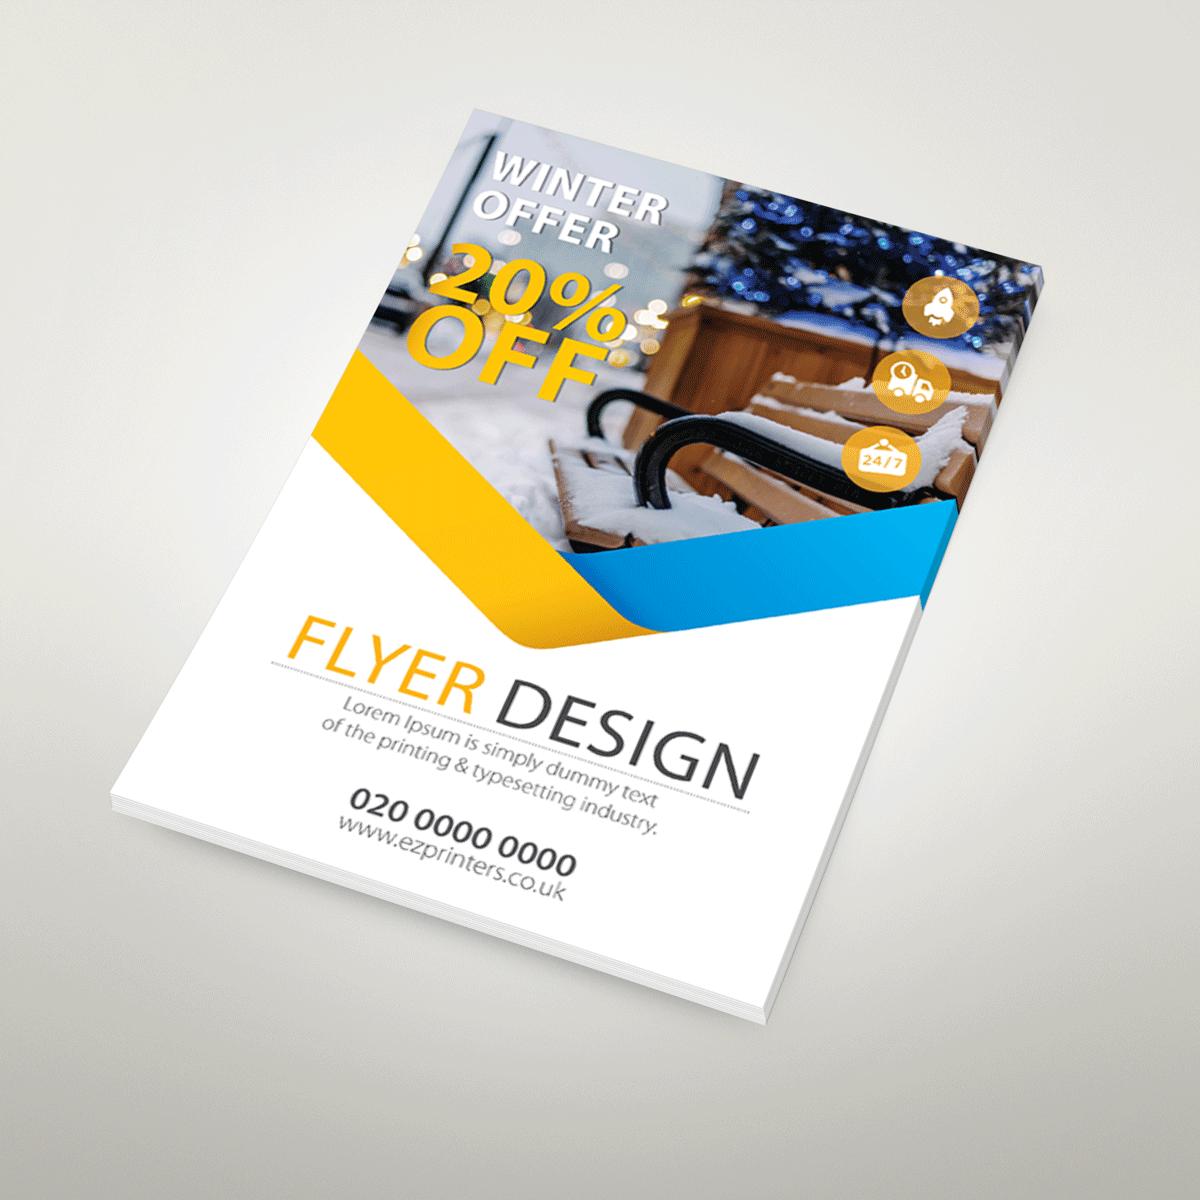 A6 Flyers Amp Leaflets Printing London Ez Printers